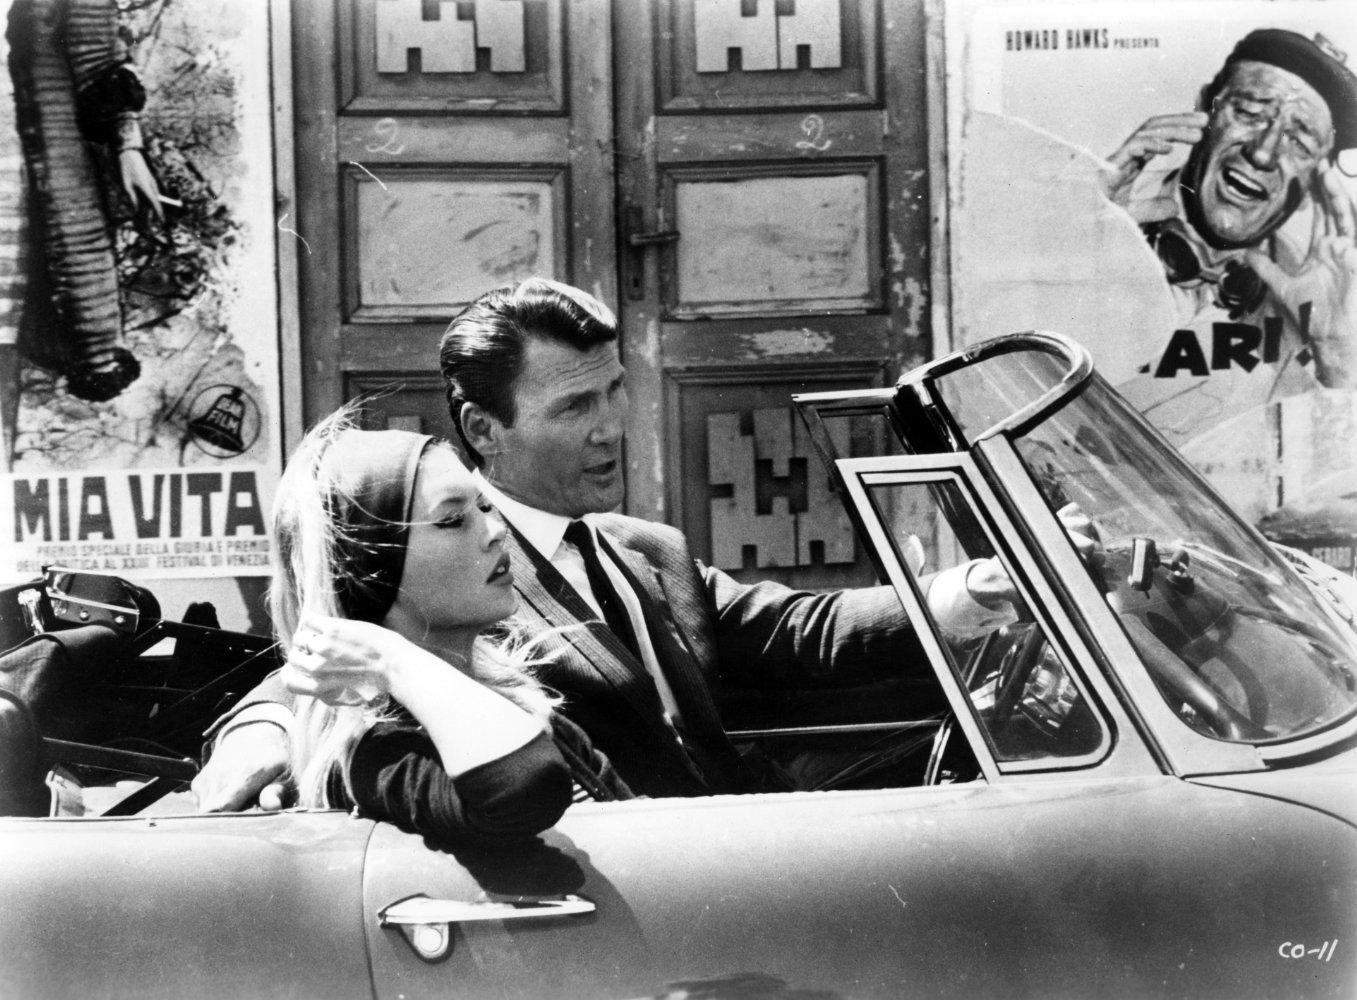 Jack Palance Filmes Complete brigitte bardot and jack palance in le mépris (1963) | [][]window